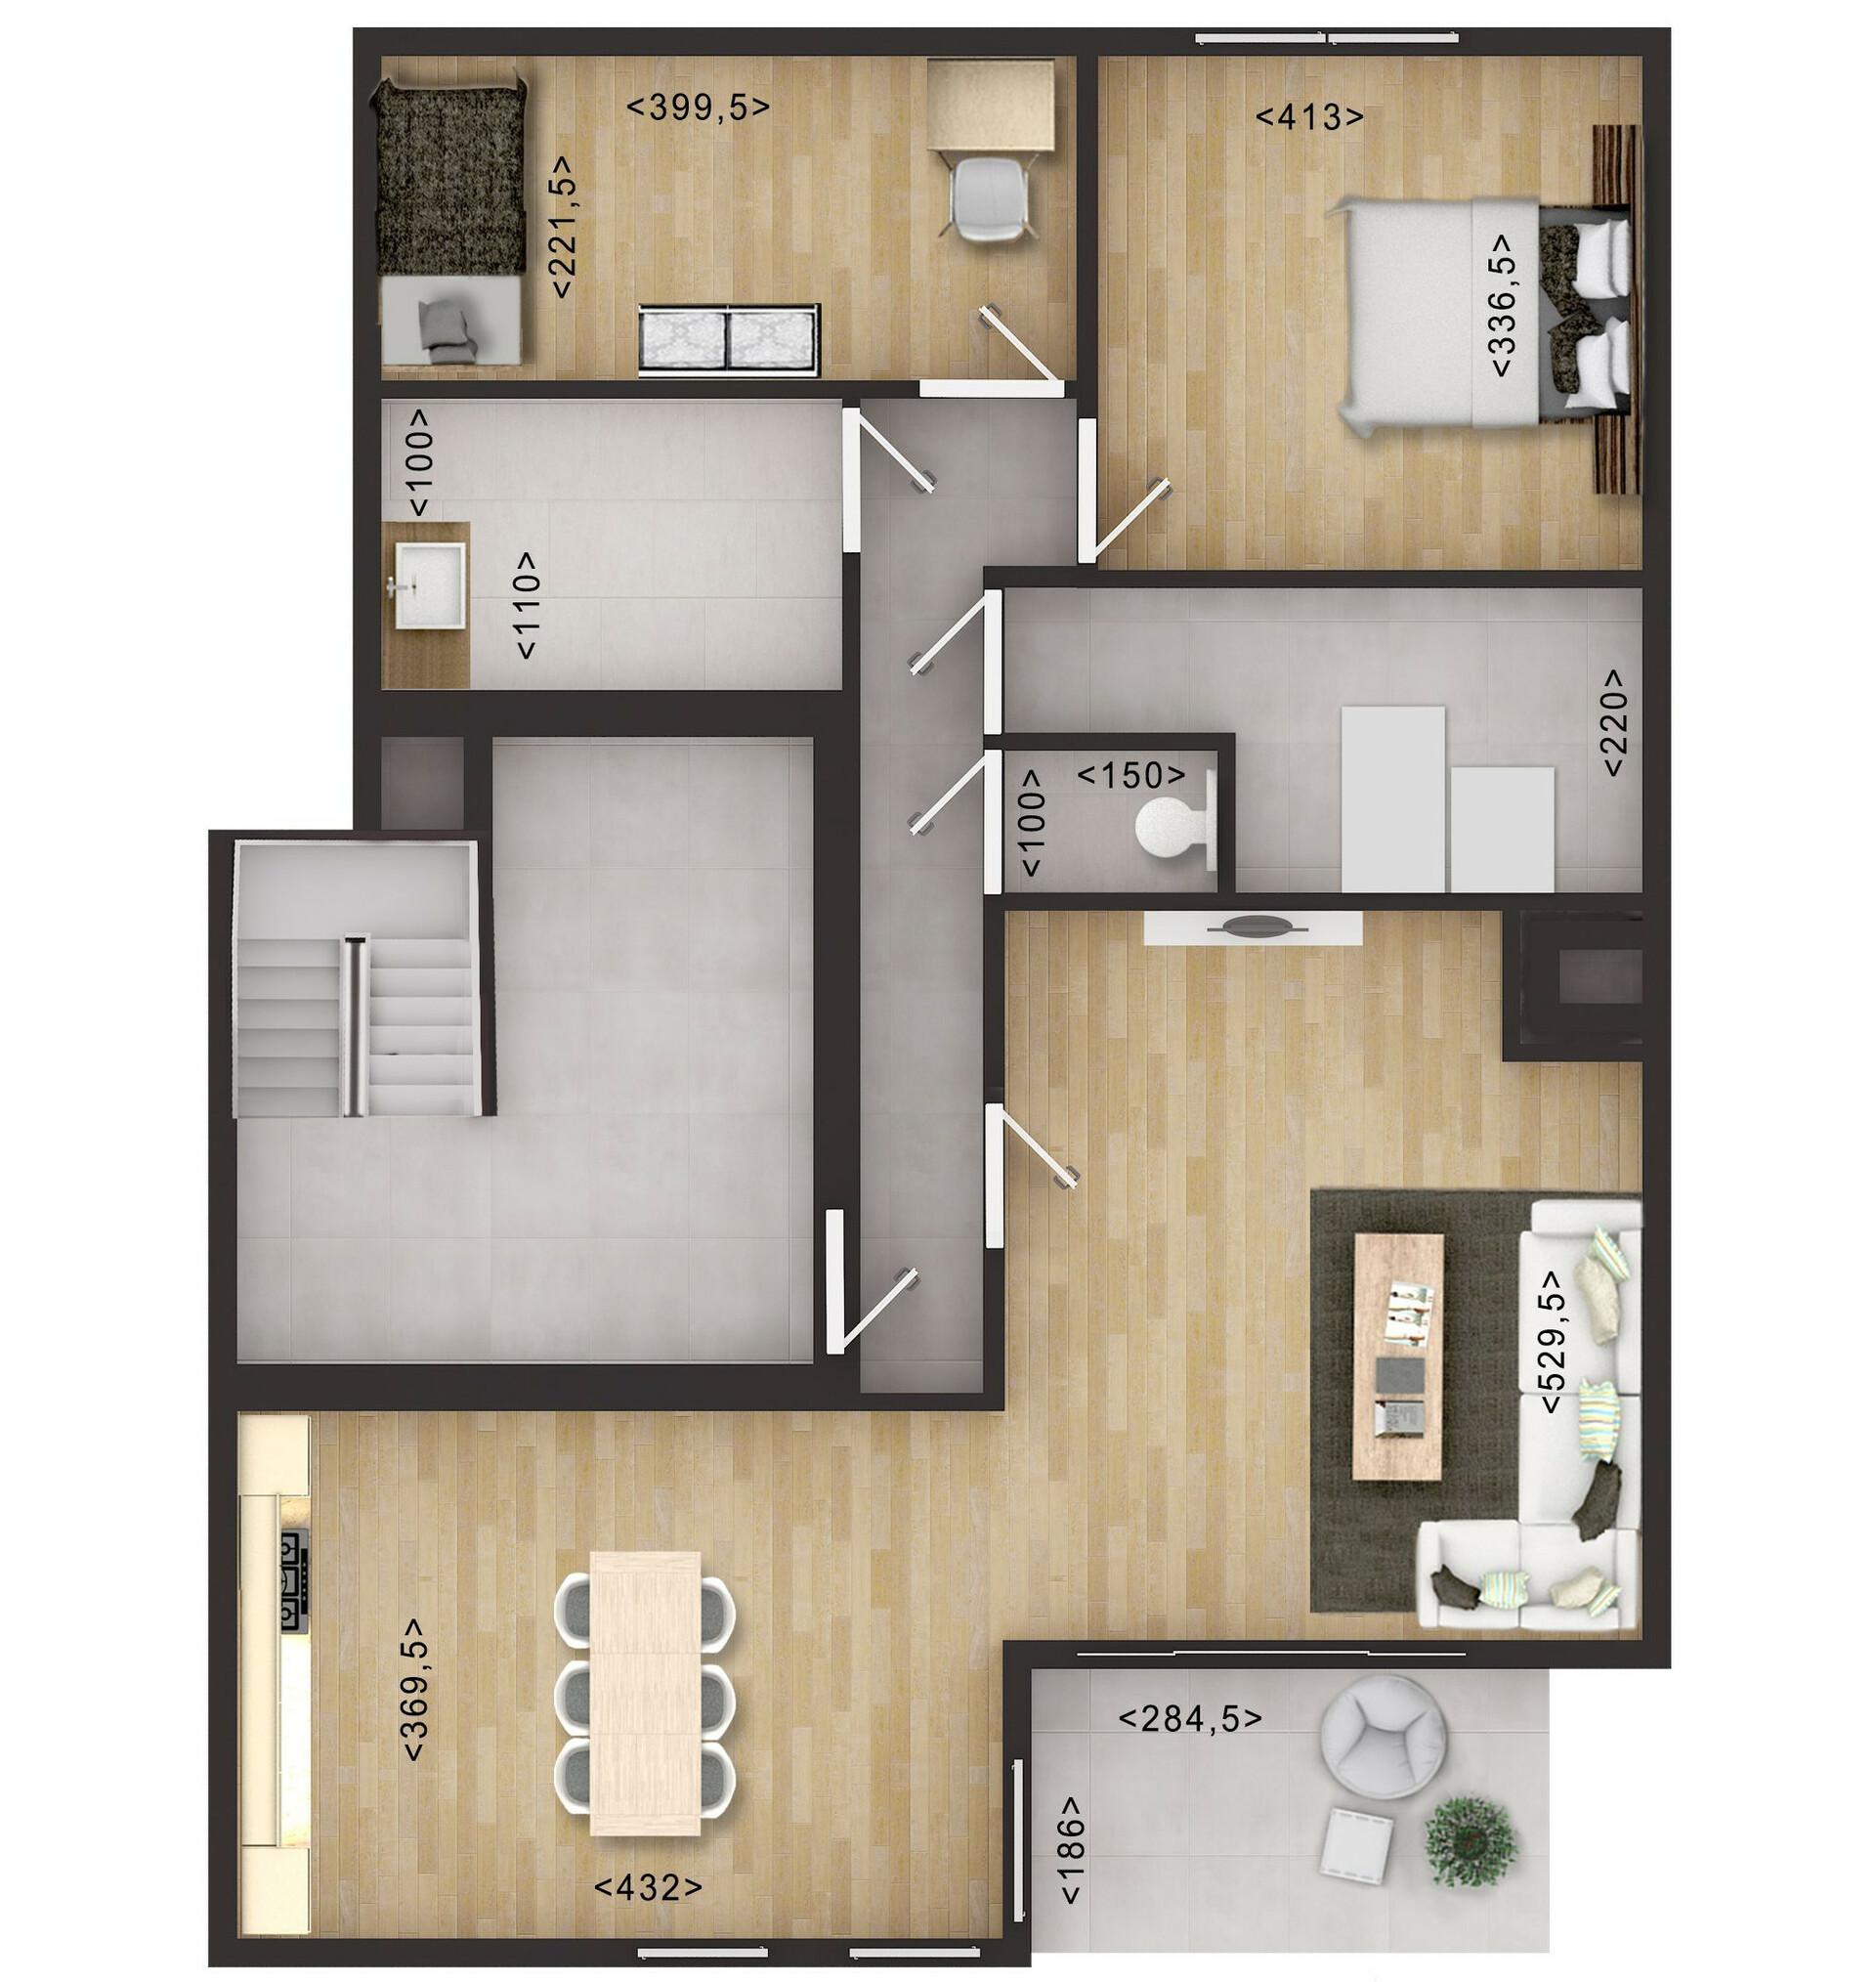 Artstation 2d And 3d Floor Plan Rendering Services Jmsd Consultant